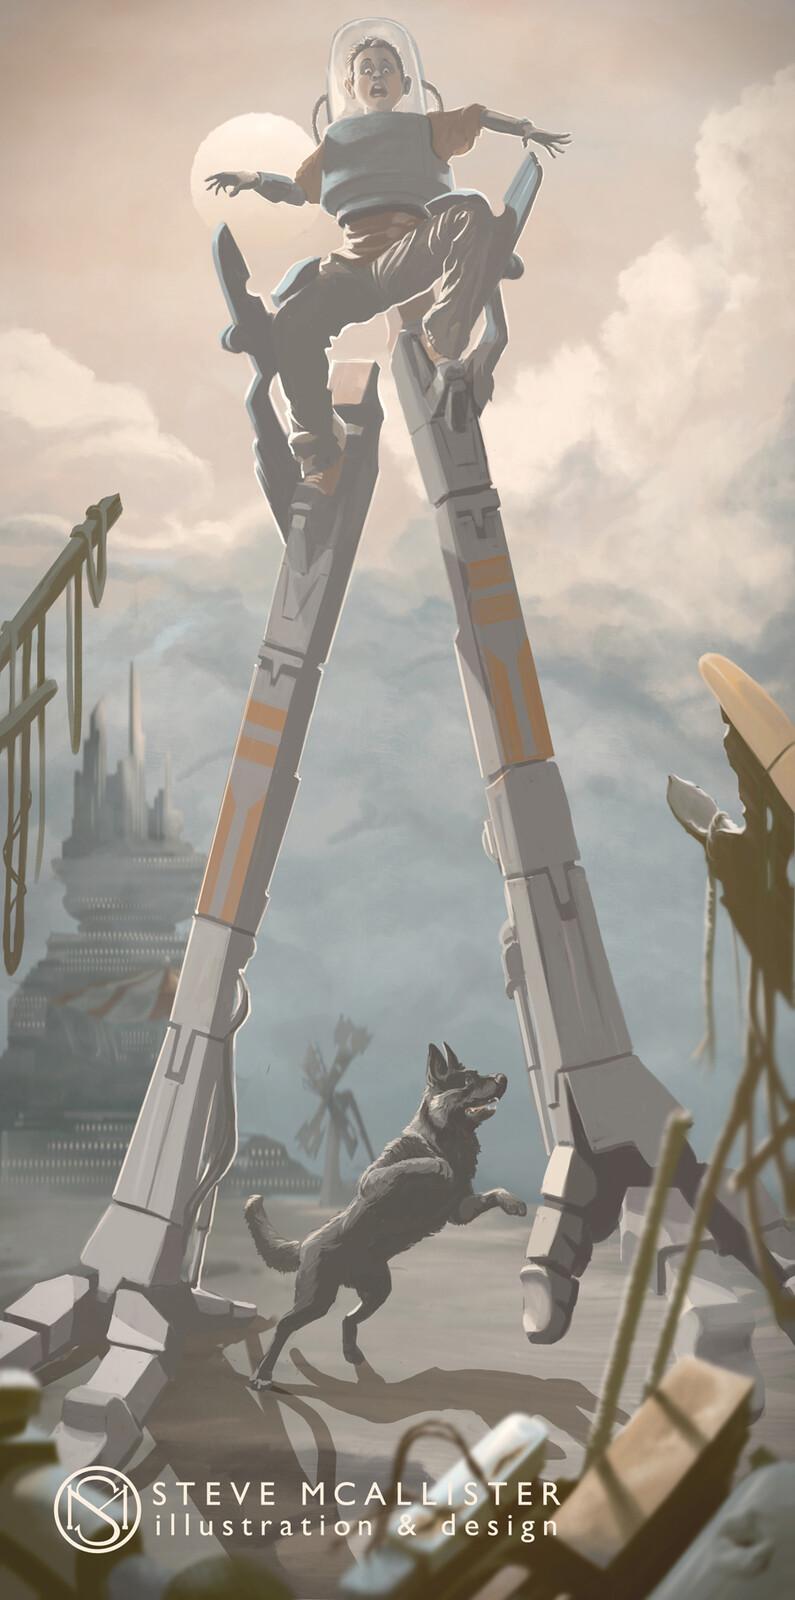 Sci-fi, Children's art, concept illustration